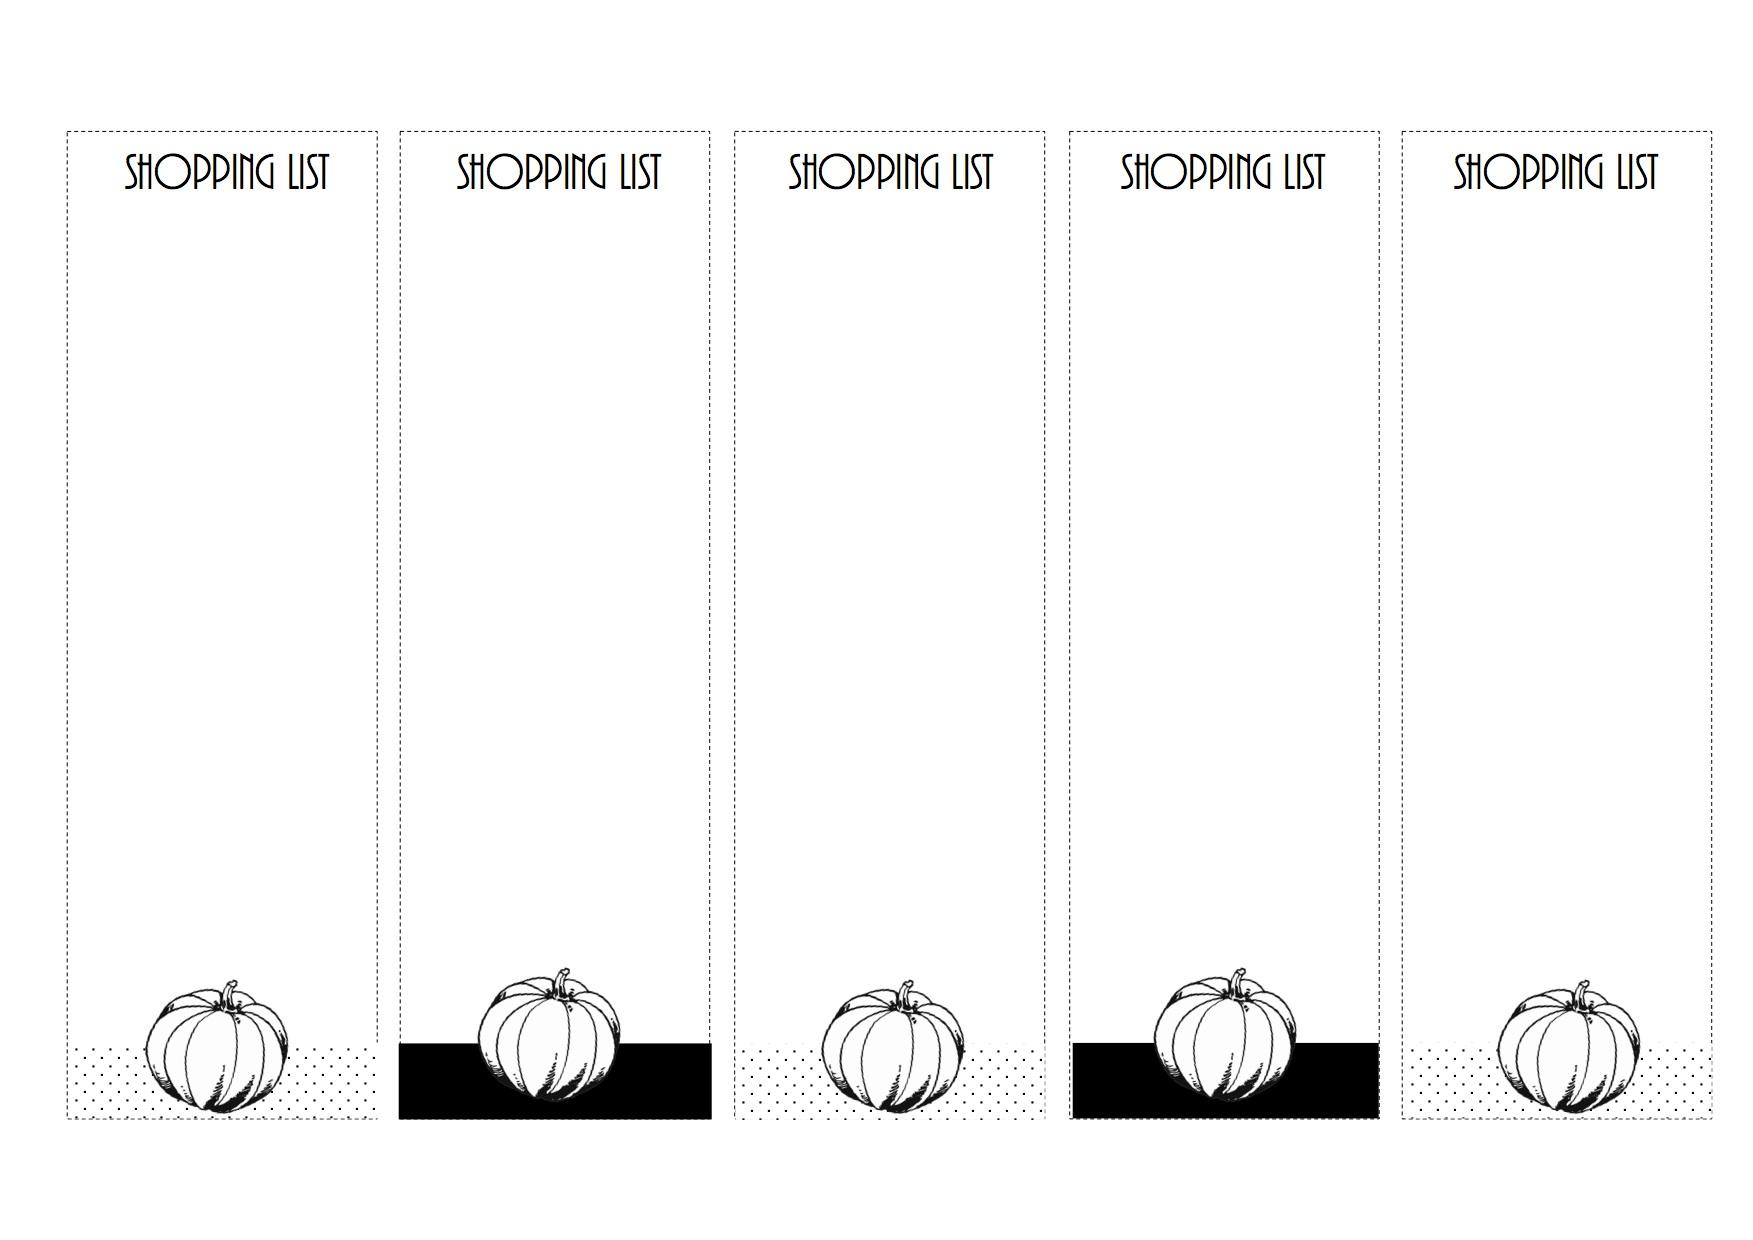 2013-10 - Shopping list.jpg